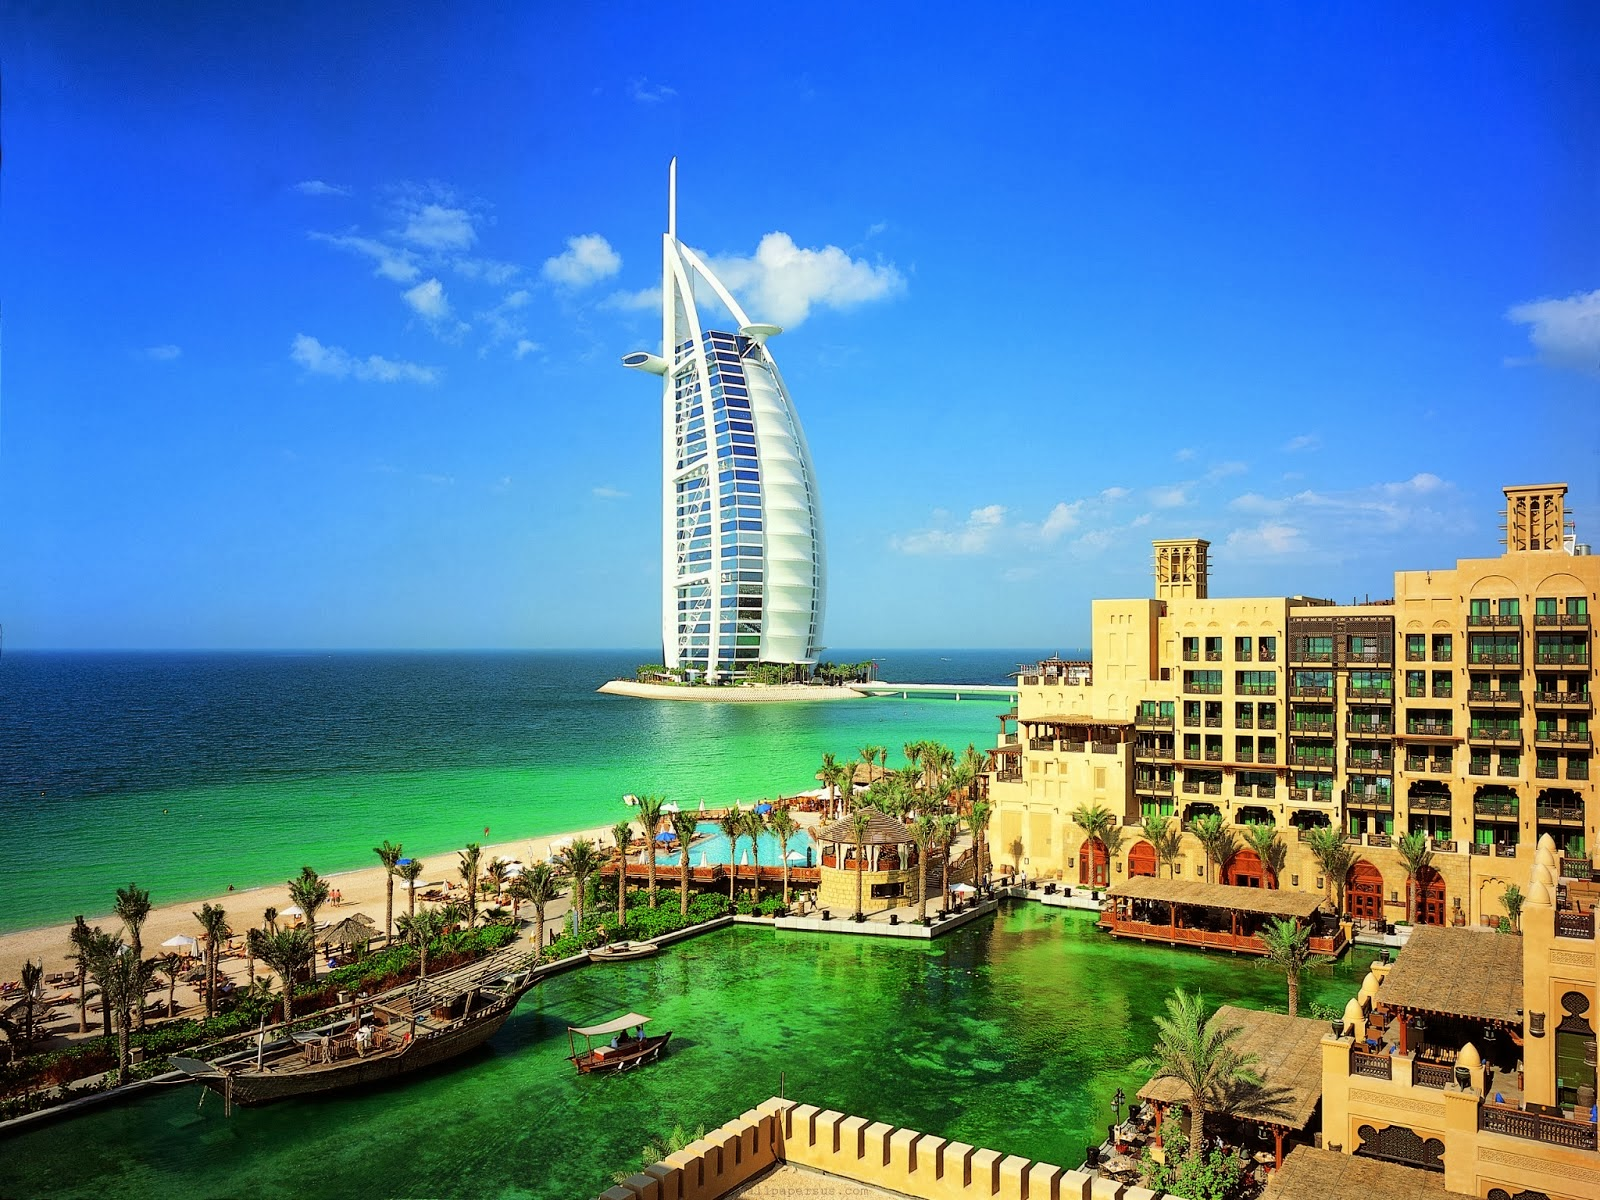 Luxury life design top 5 must do luxury experiences in dubai for Dubai luxury